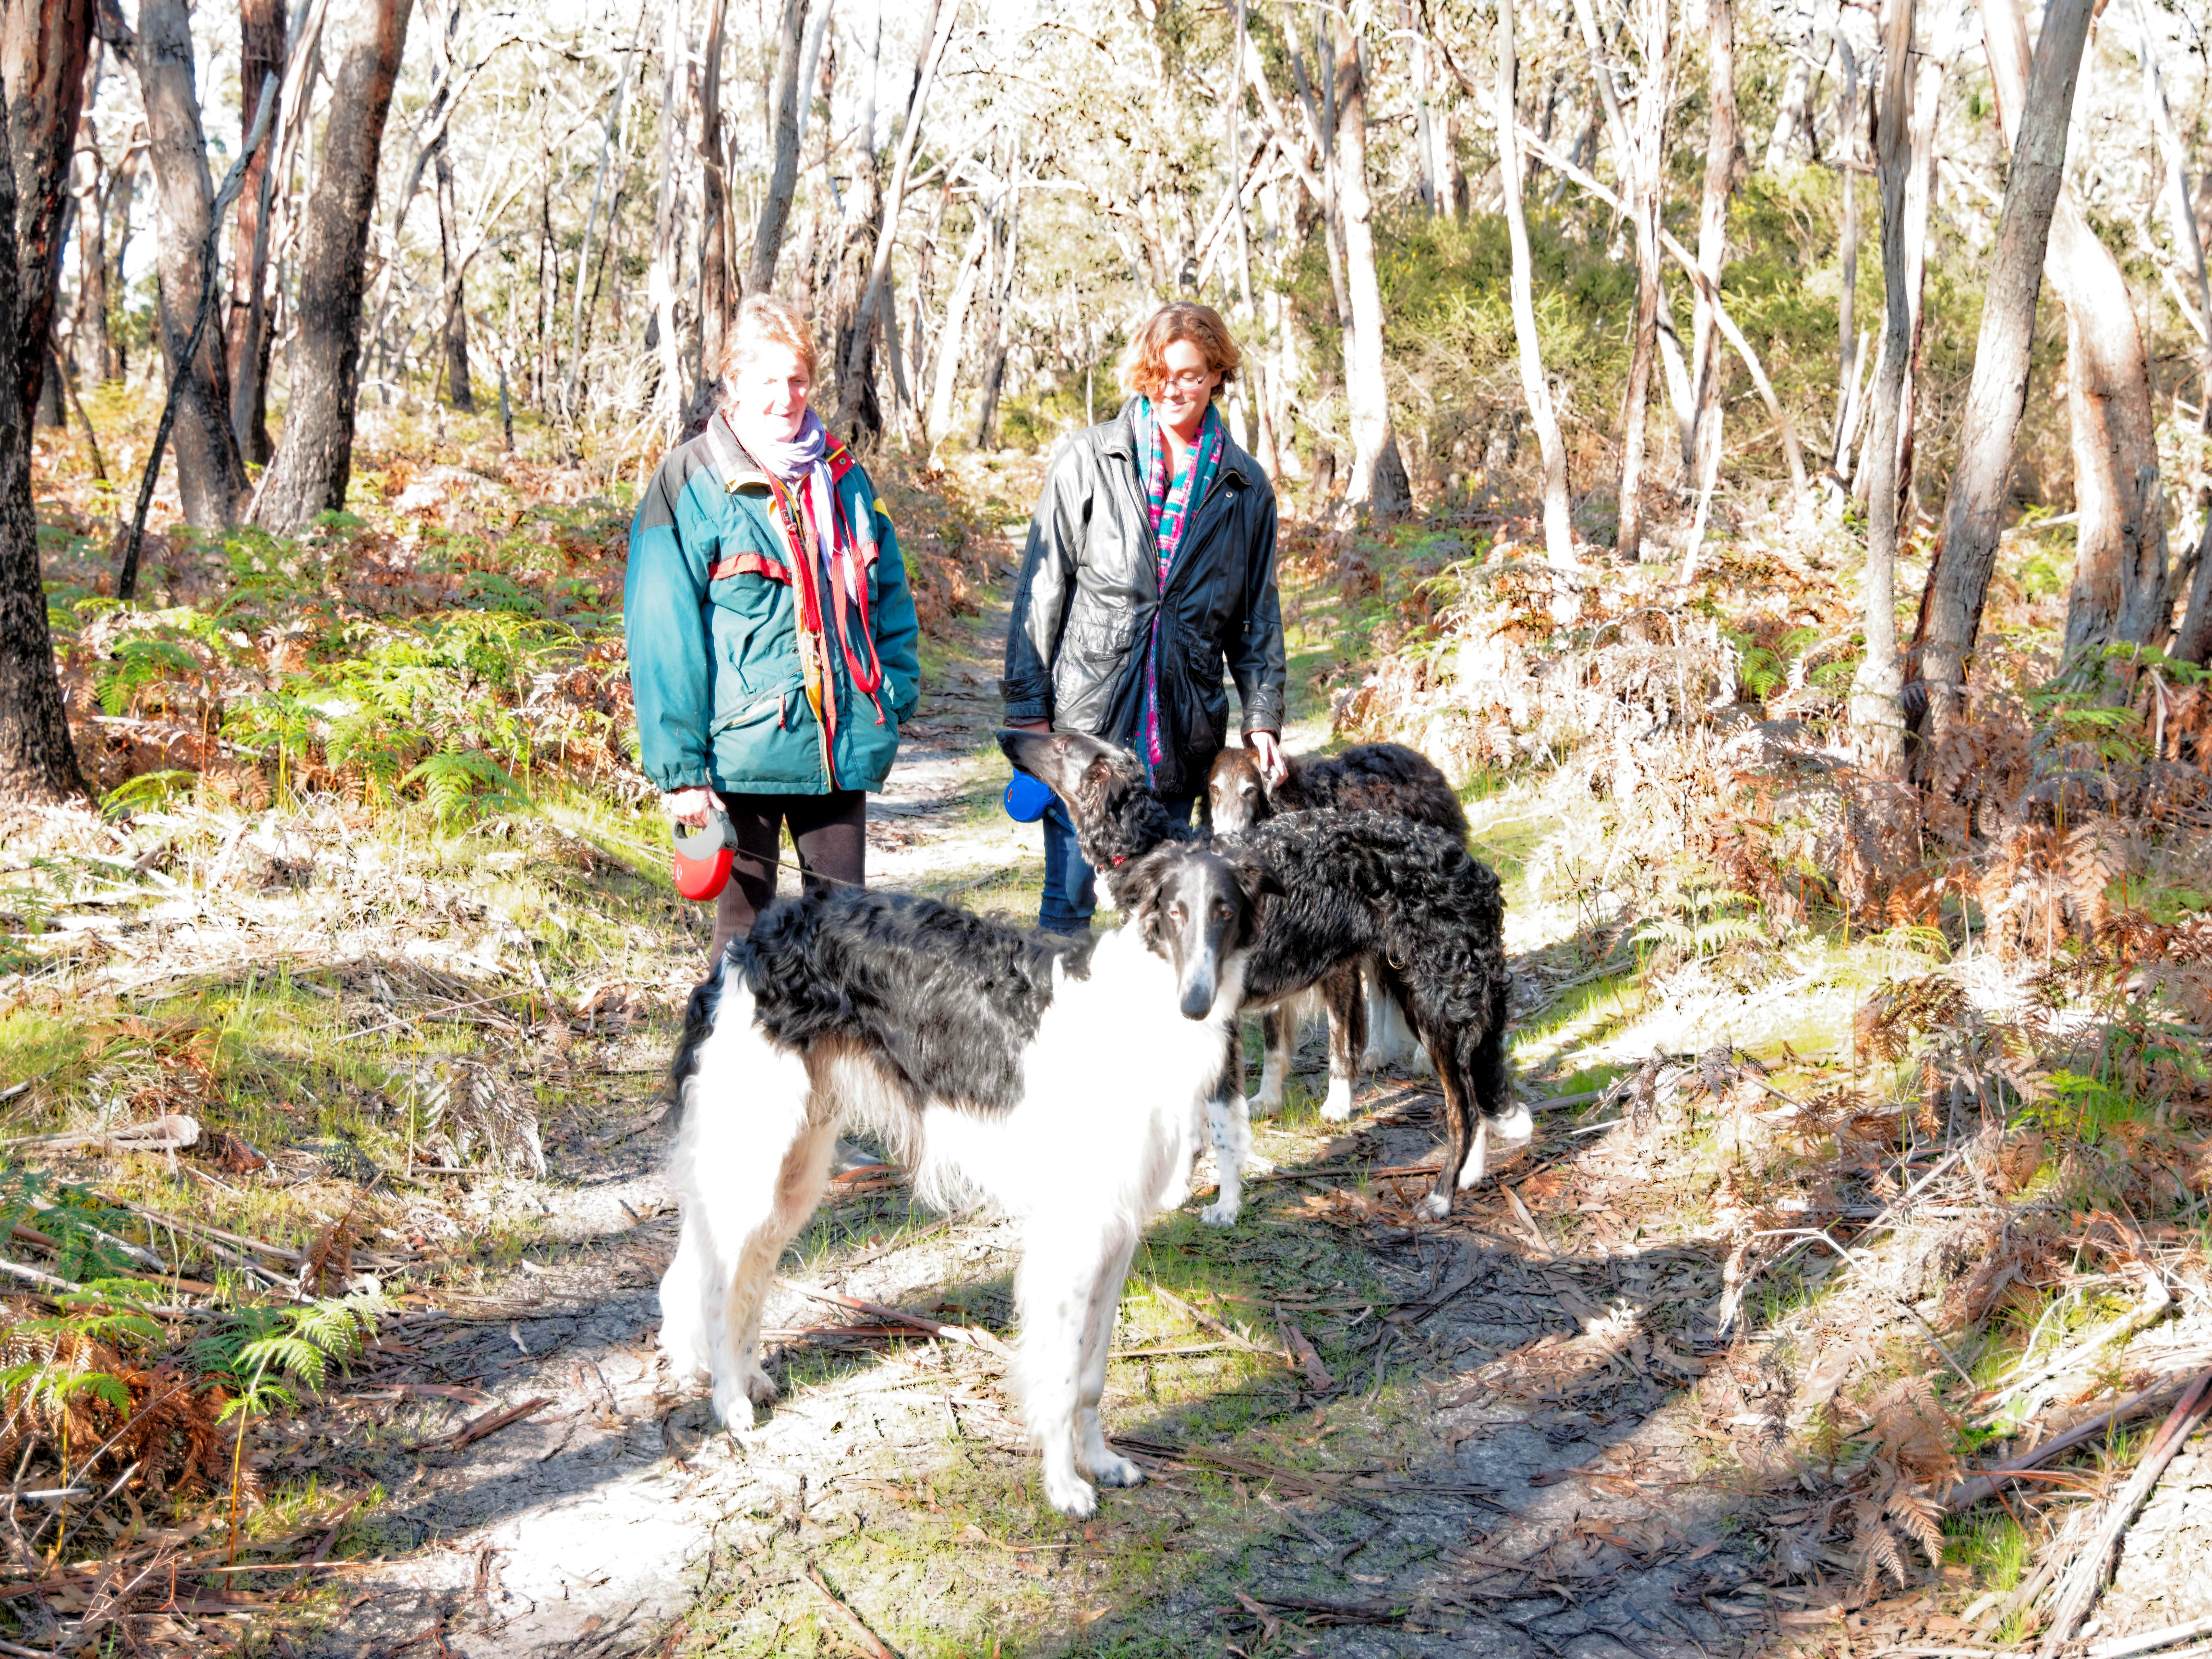 Walk-in-forest-14.jpeg